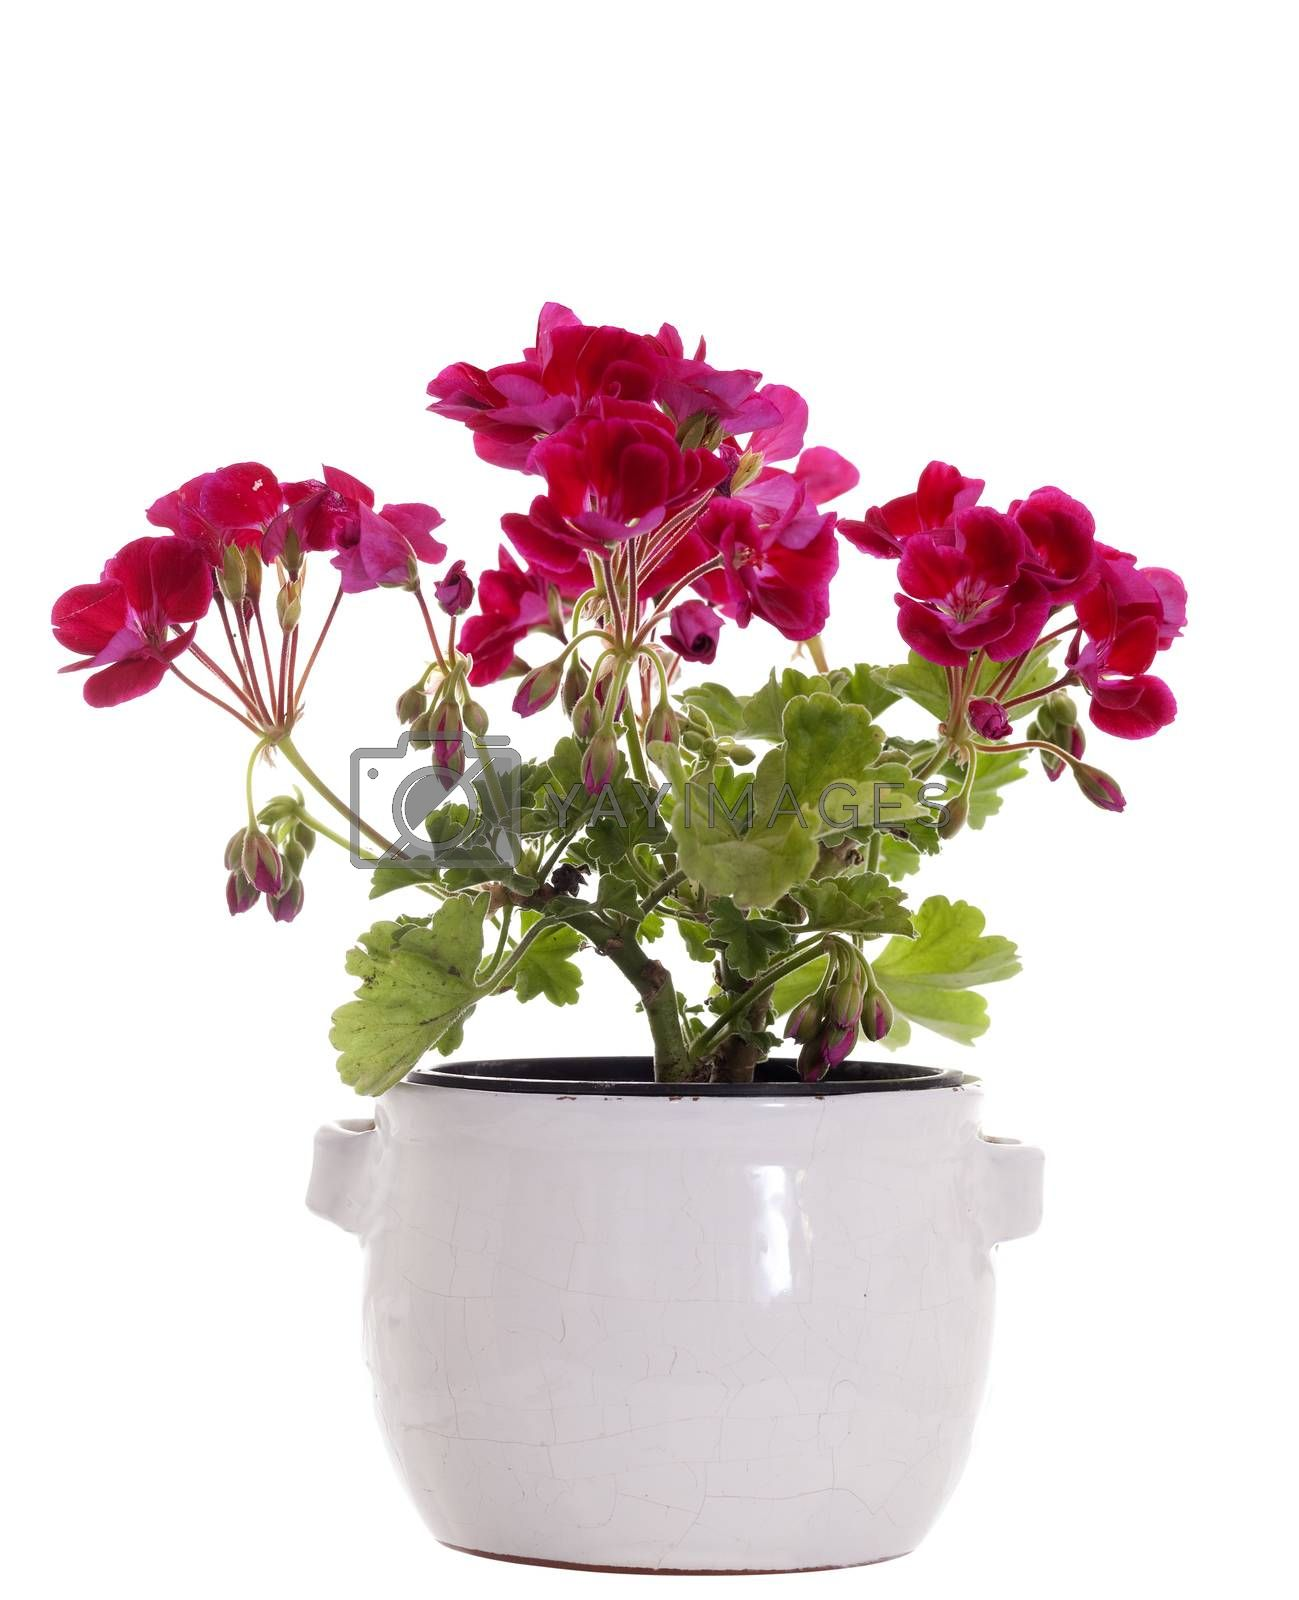 decorative flower in flower-pot on white background